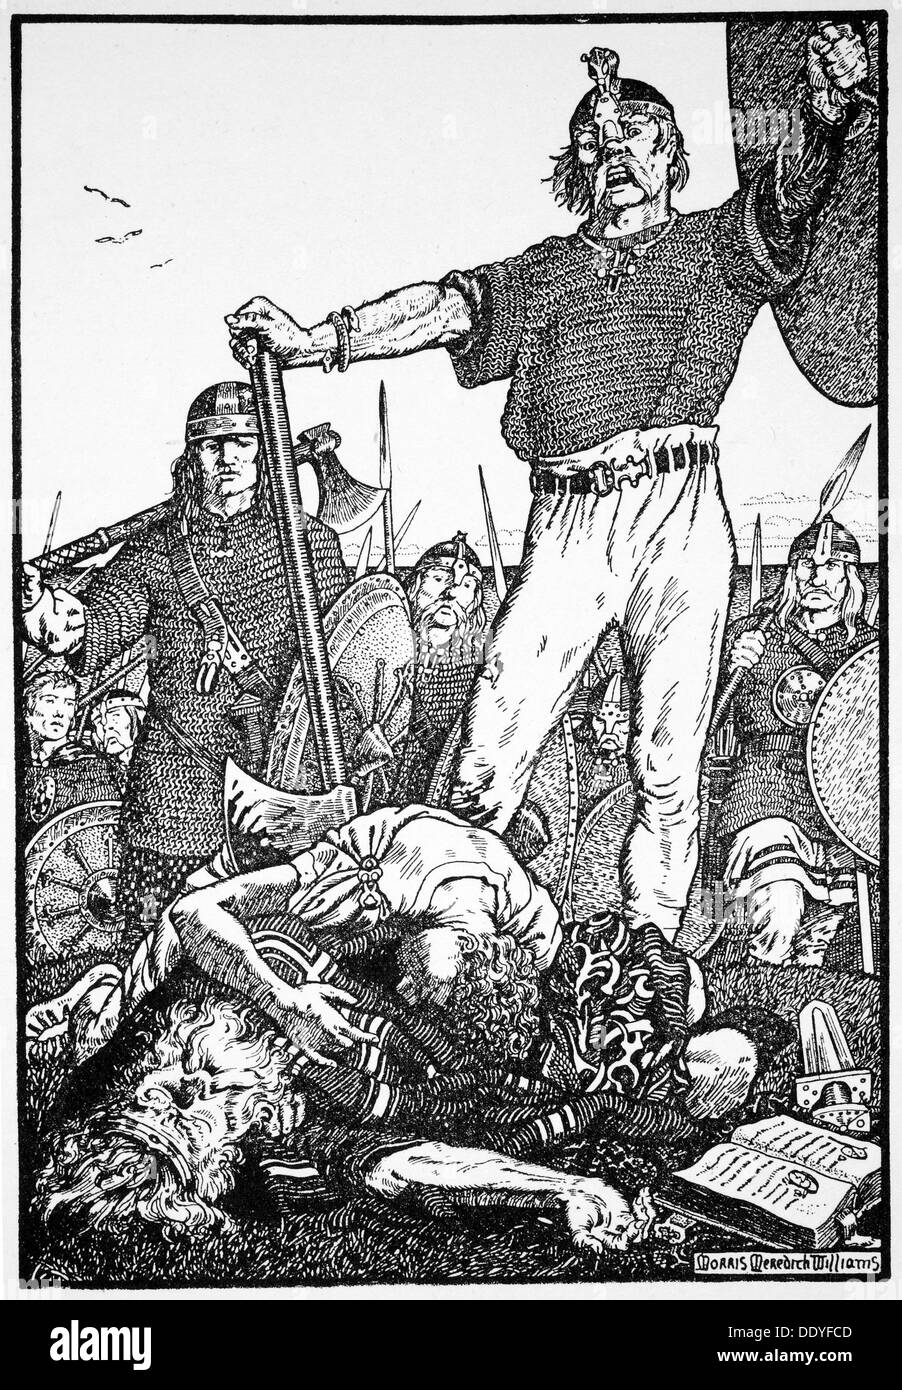 Death of Brian Boru at the Battle of Clontarf, Ireland, 1014 (1913).  Artist: Morris Meredith Williams